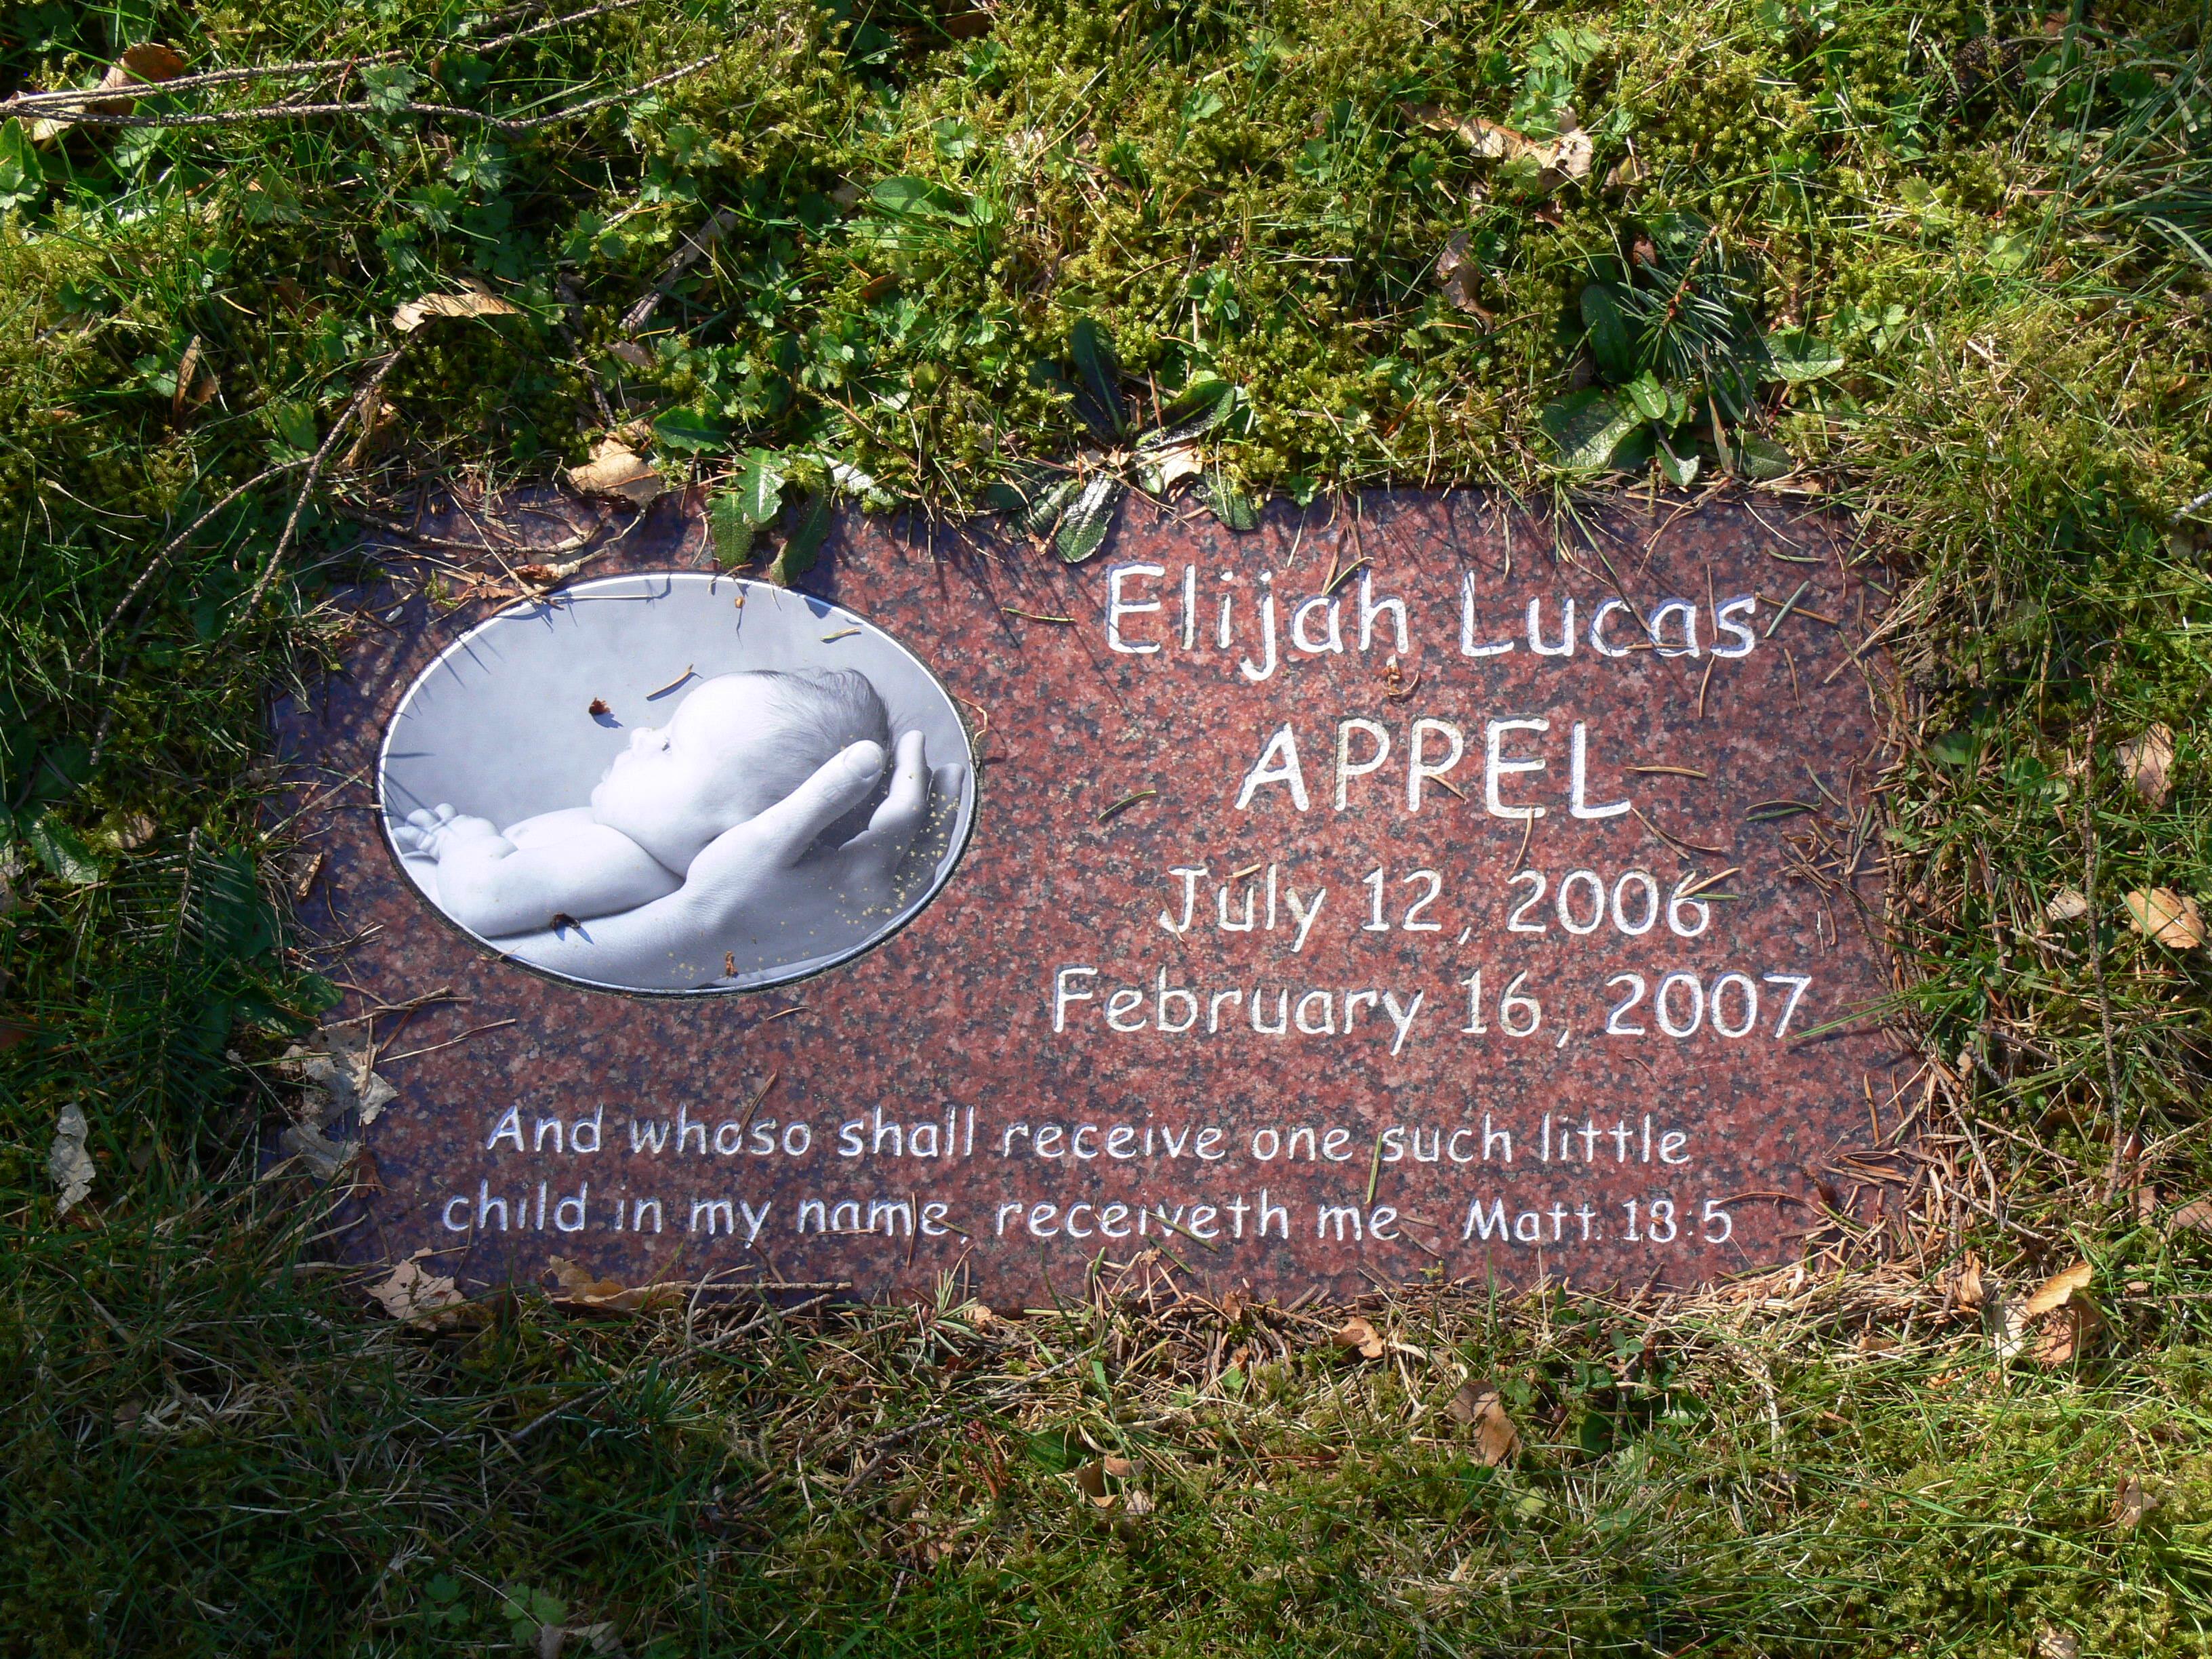 Elijah Lucas Appel